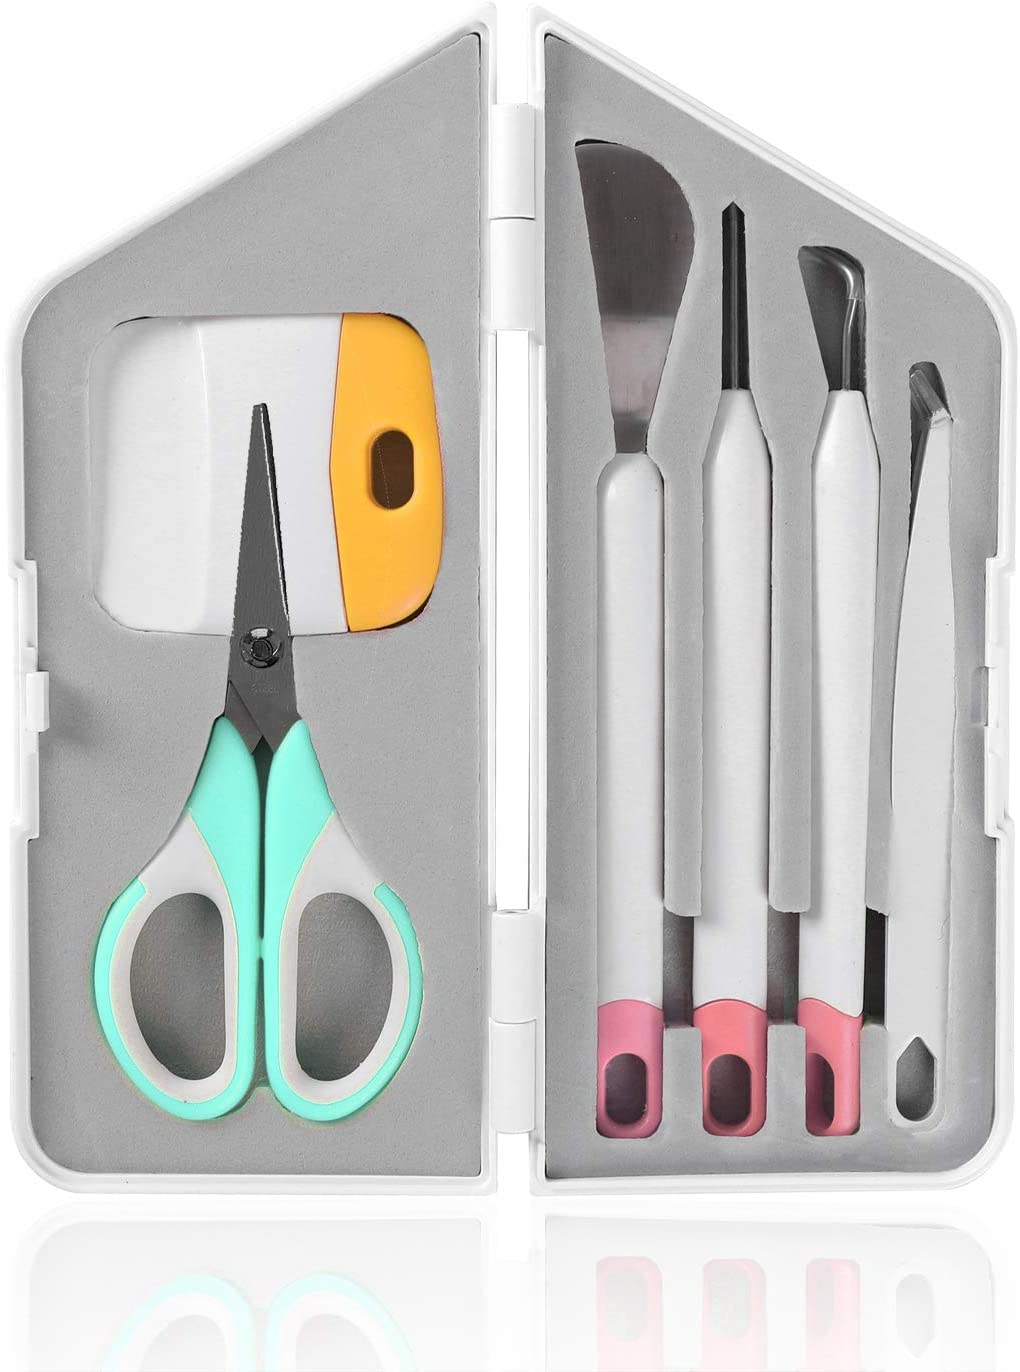 for Cricut//Silhouette//Siser//Oracal 631 651 751 Vinyl Tweezers,Scissors Craft Vinyl Weeding Tools,Precision Craft Vinyl Tools Set,Weeders Spatula,XL Scraper and Felt Storage Bag